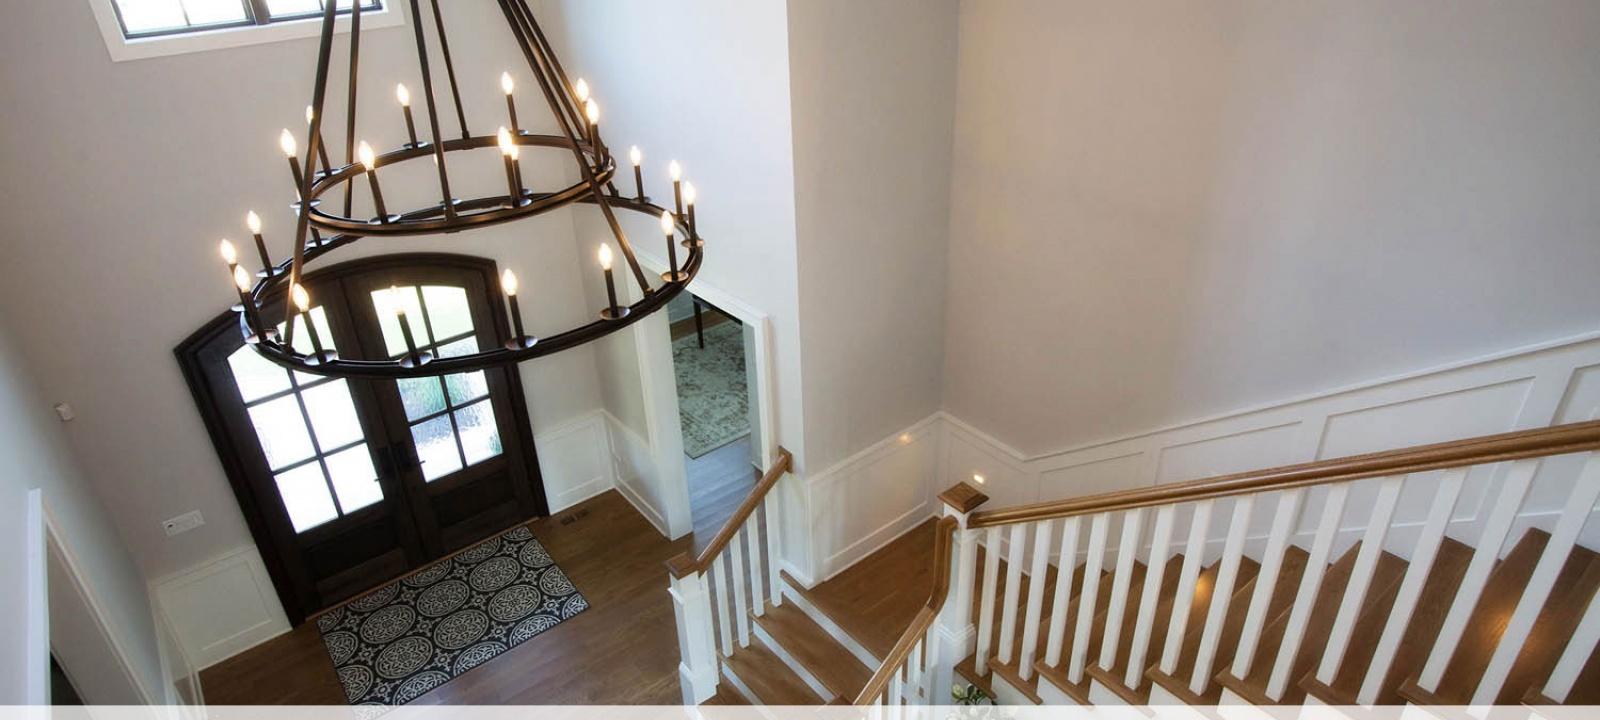 2 Devondale Lane, Frontenac, Missouri 63131, 5 Bedrooms Bedrooms, ,4 BathroomsBathrooms,House,For Sale,Devondale Lane,1023